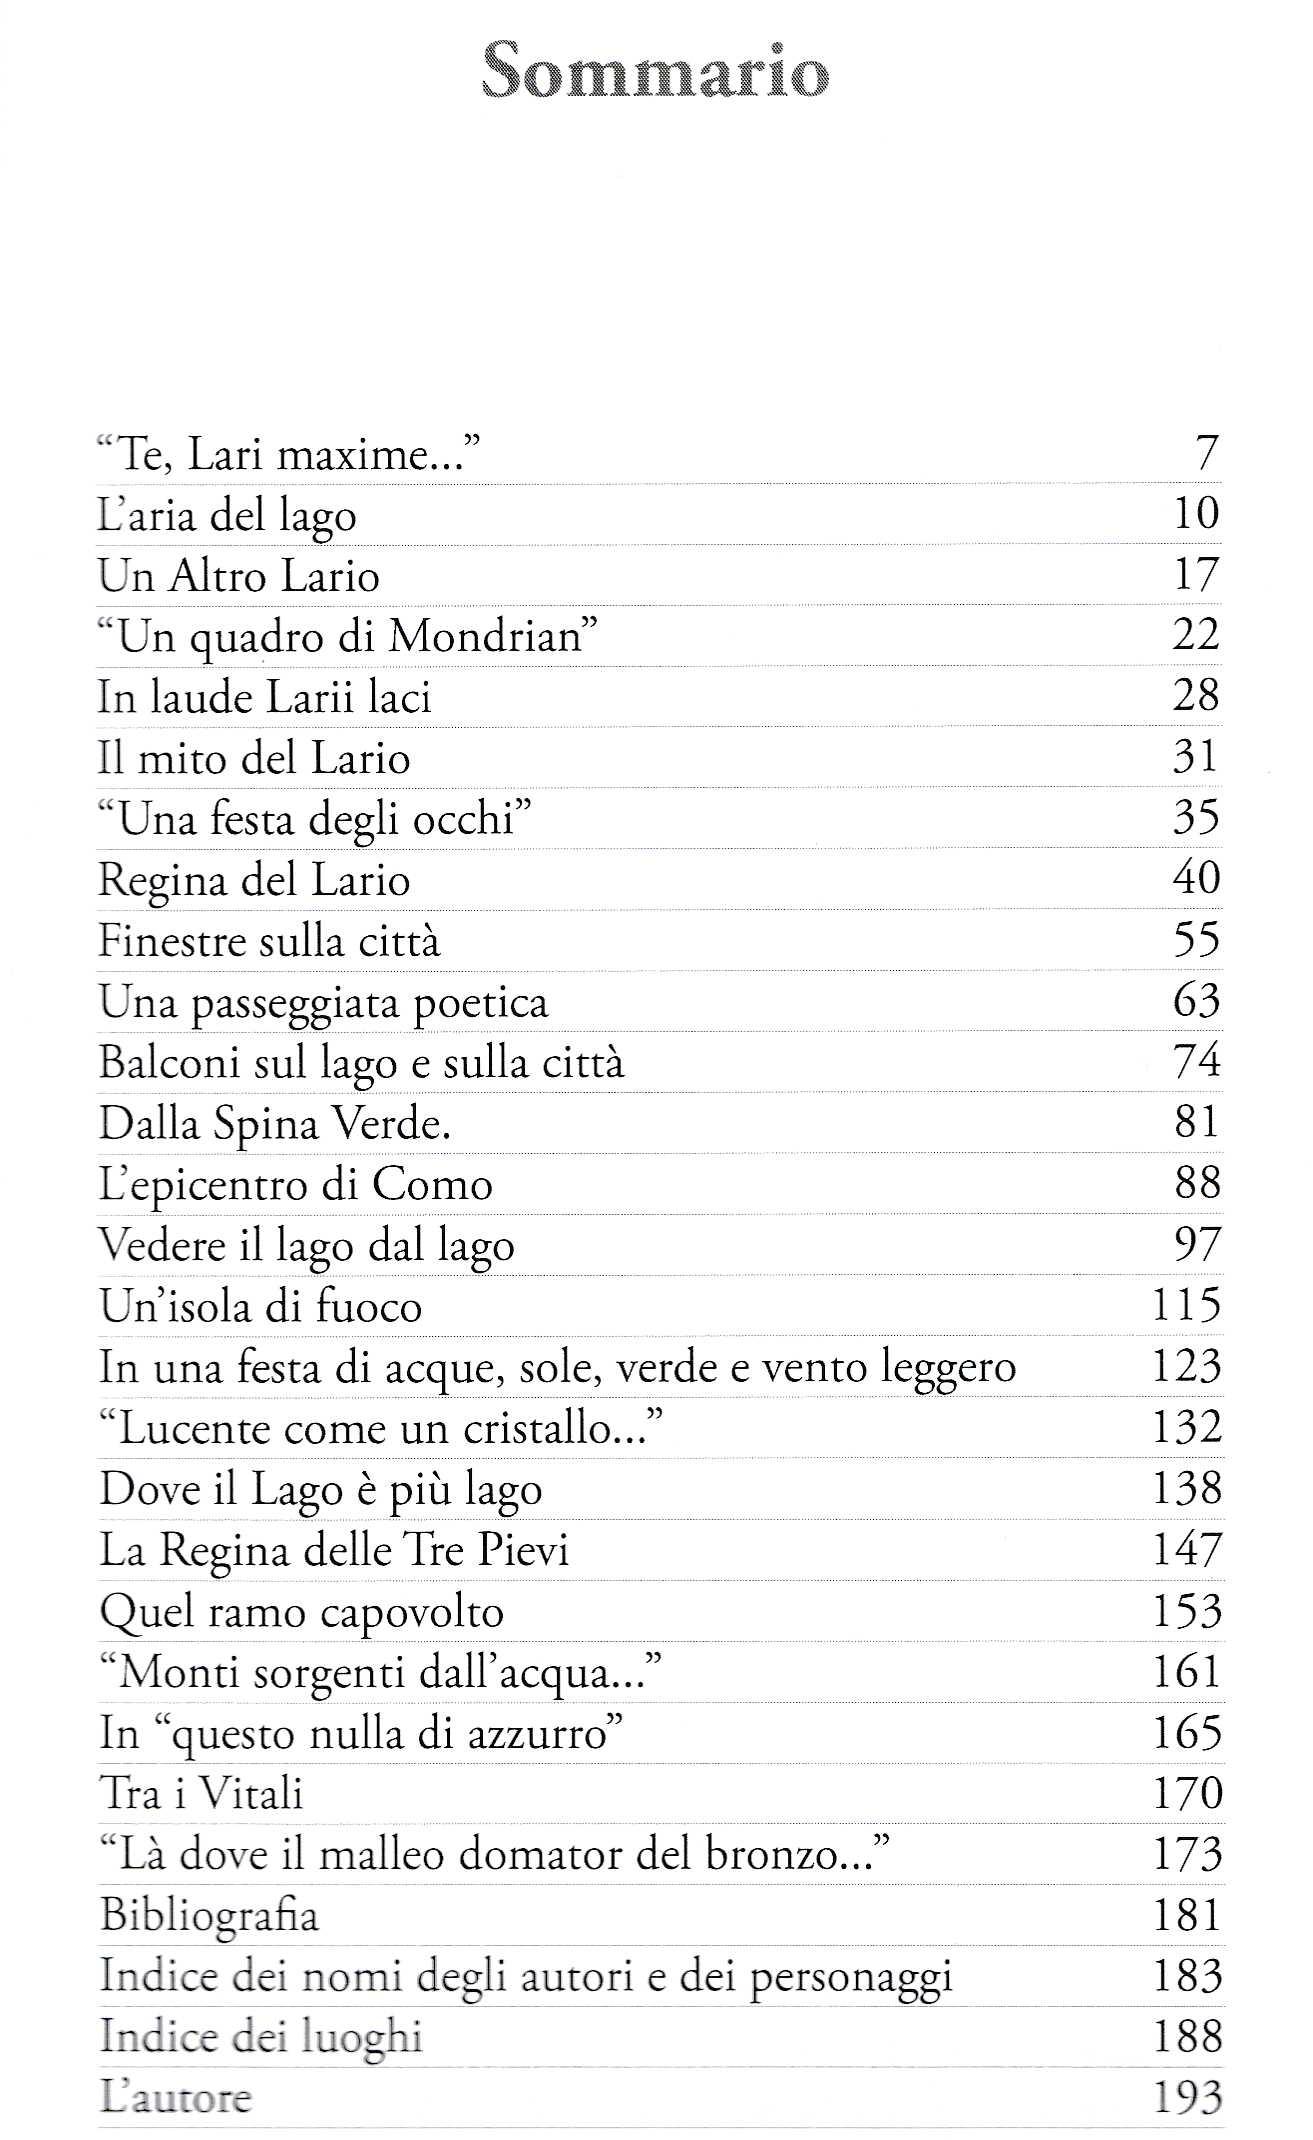 guarracino4541